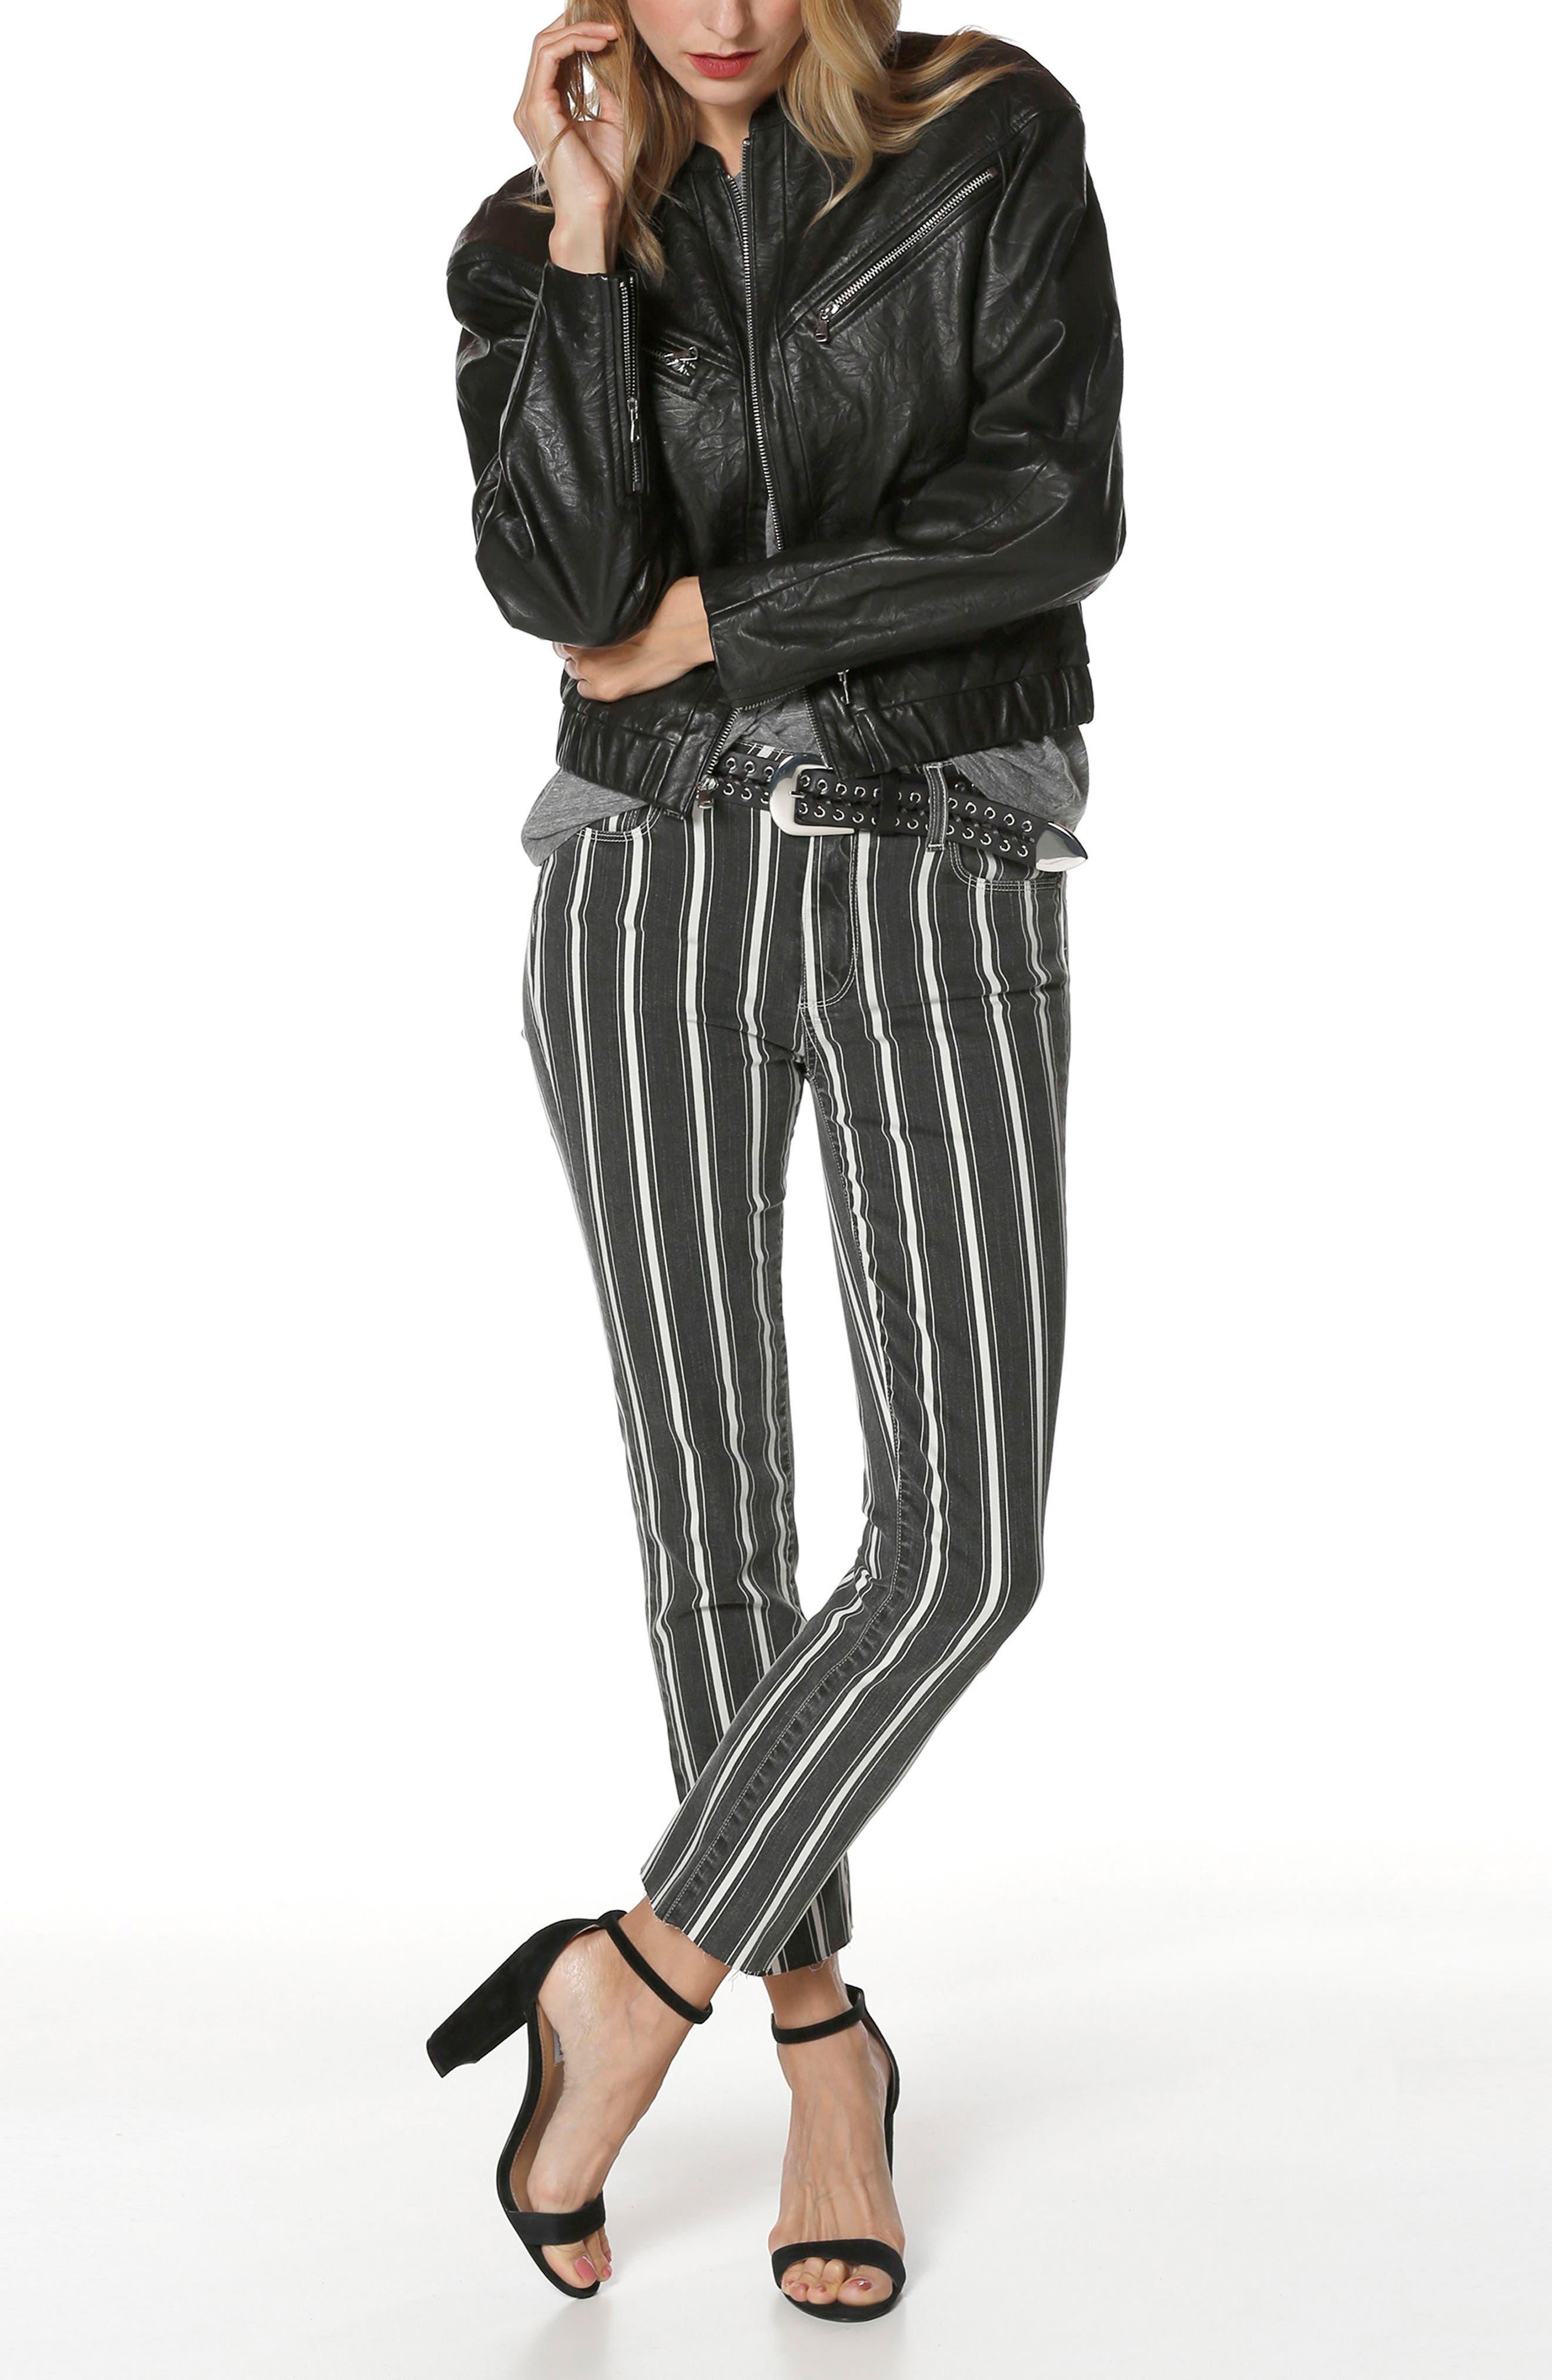 Giana Leather Moto Jacket,                             Alternate thumbnail 3, color,                             Black